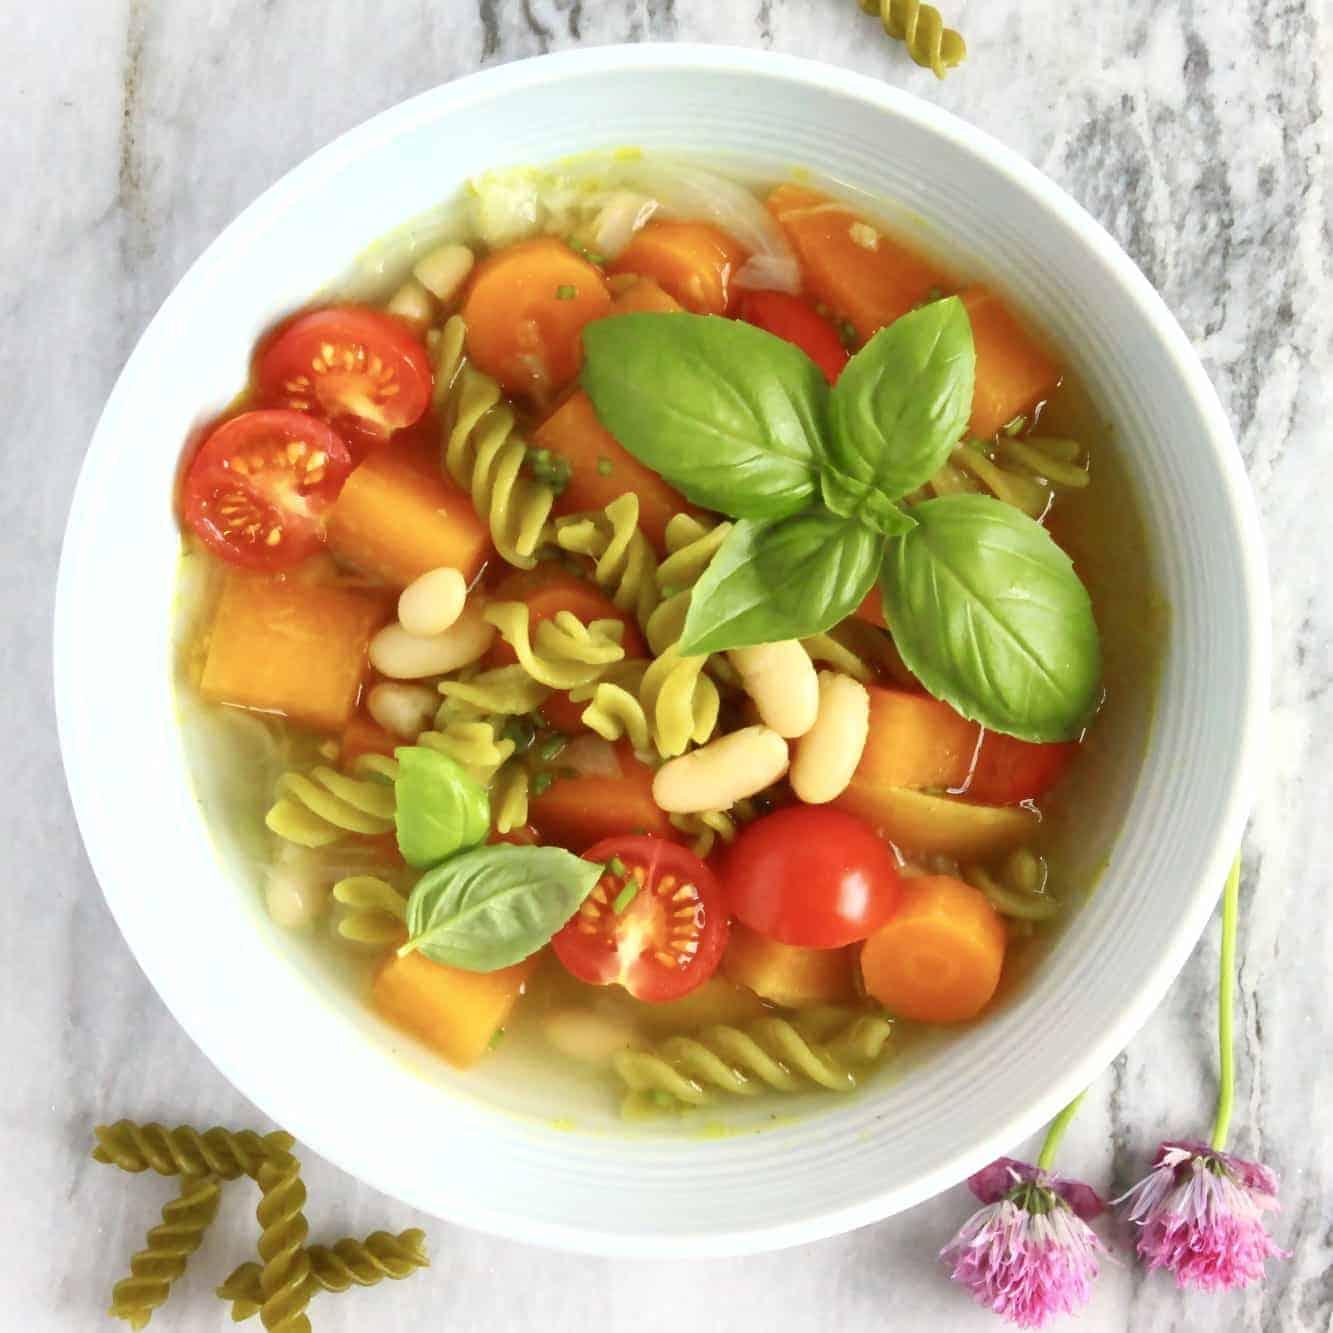 Vegan Pea Pasta Minestrone Soup (GF)